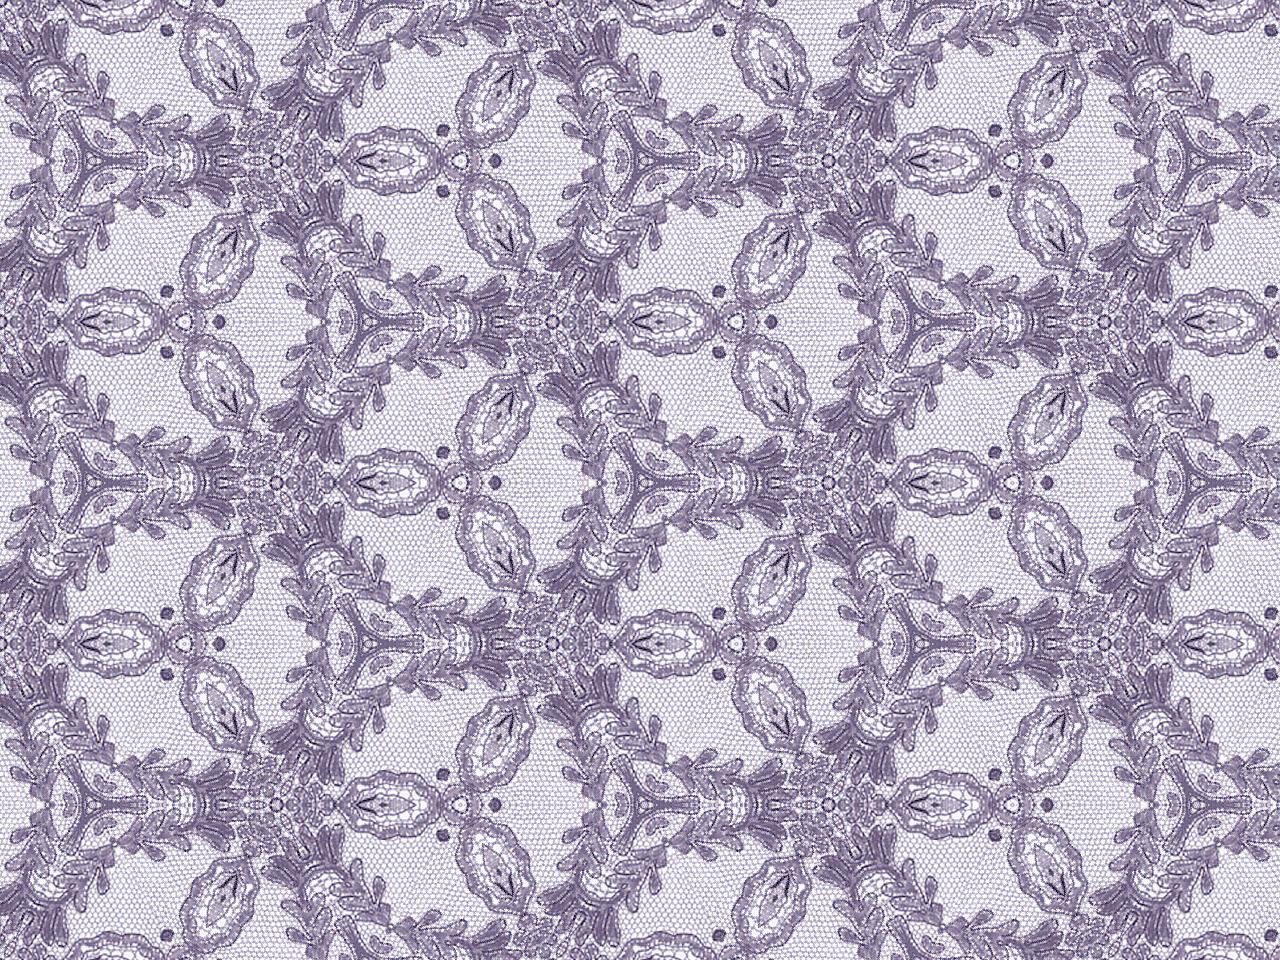 Artbyjean images of lace fine purple lace over white lace fabric backgrounds clip art - Pastel lace wallpaper ...